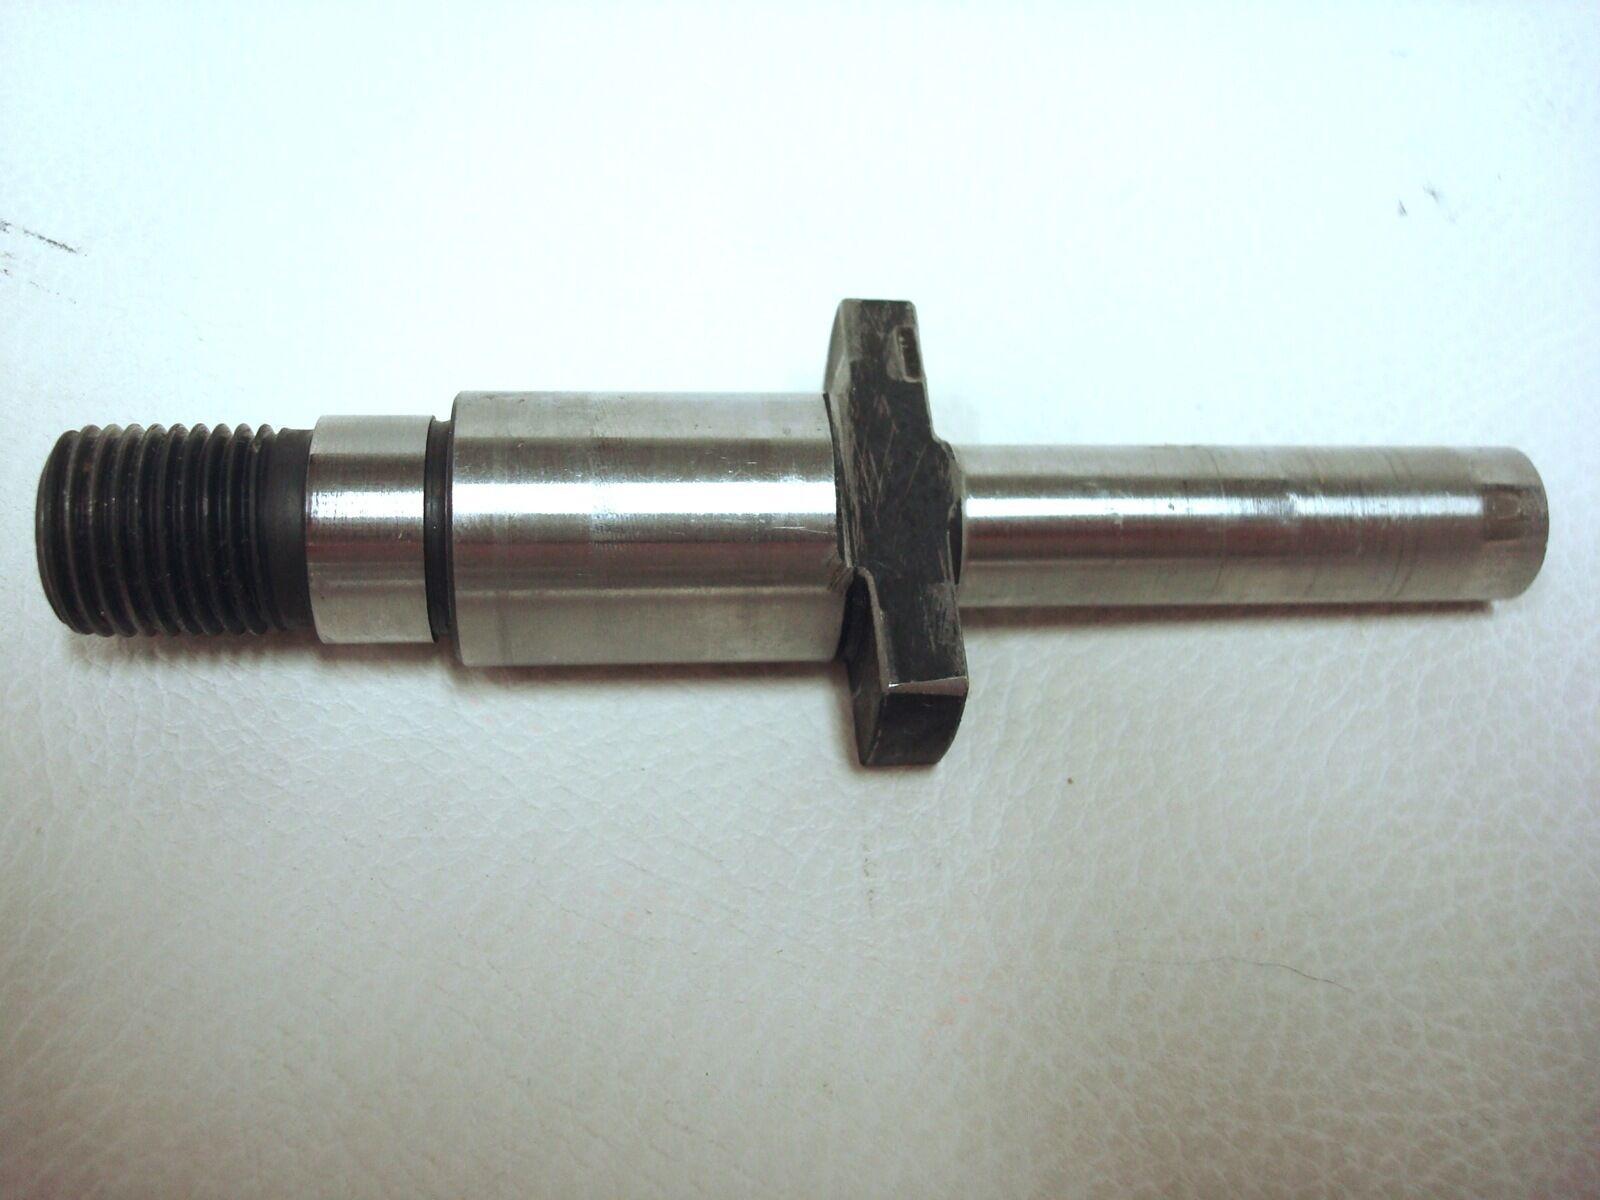 5 8 Spindle Shaft : Milwaukee threaded spindle shaft